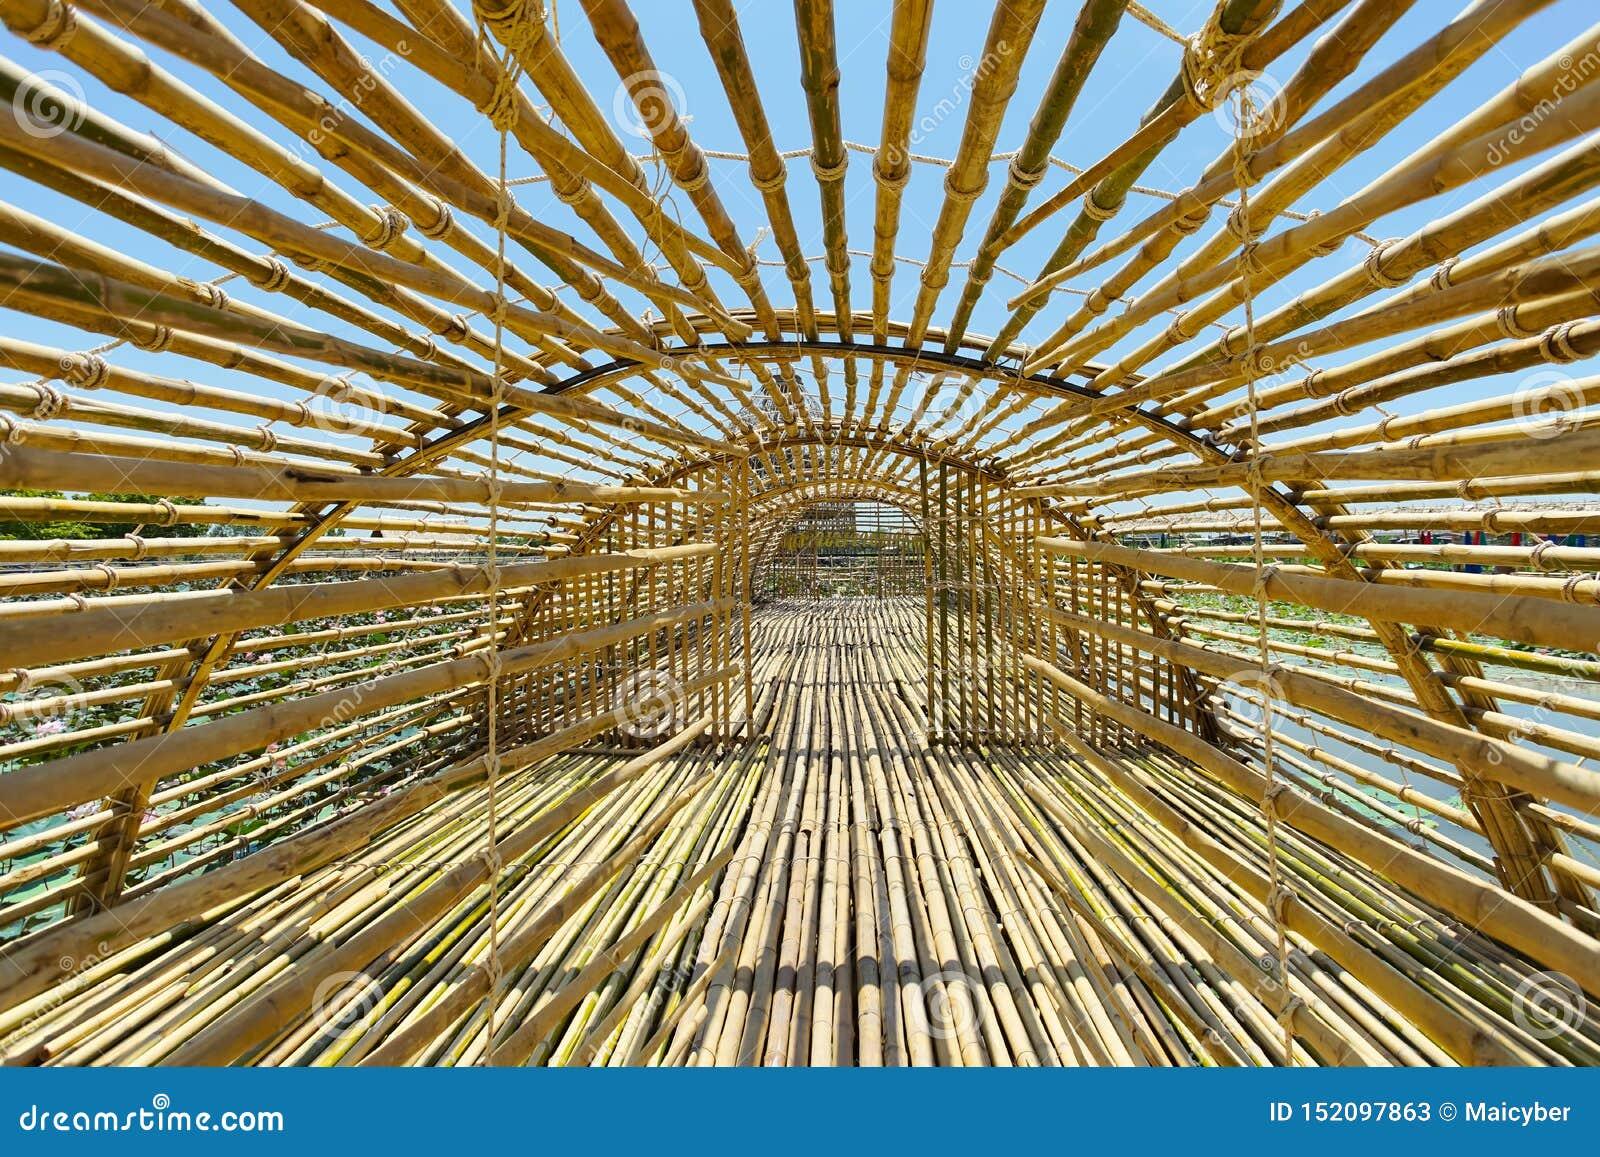 Travel Destination Bamboo Tunnel In Handcraft Baan Ton Tan